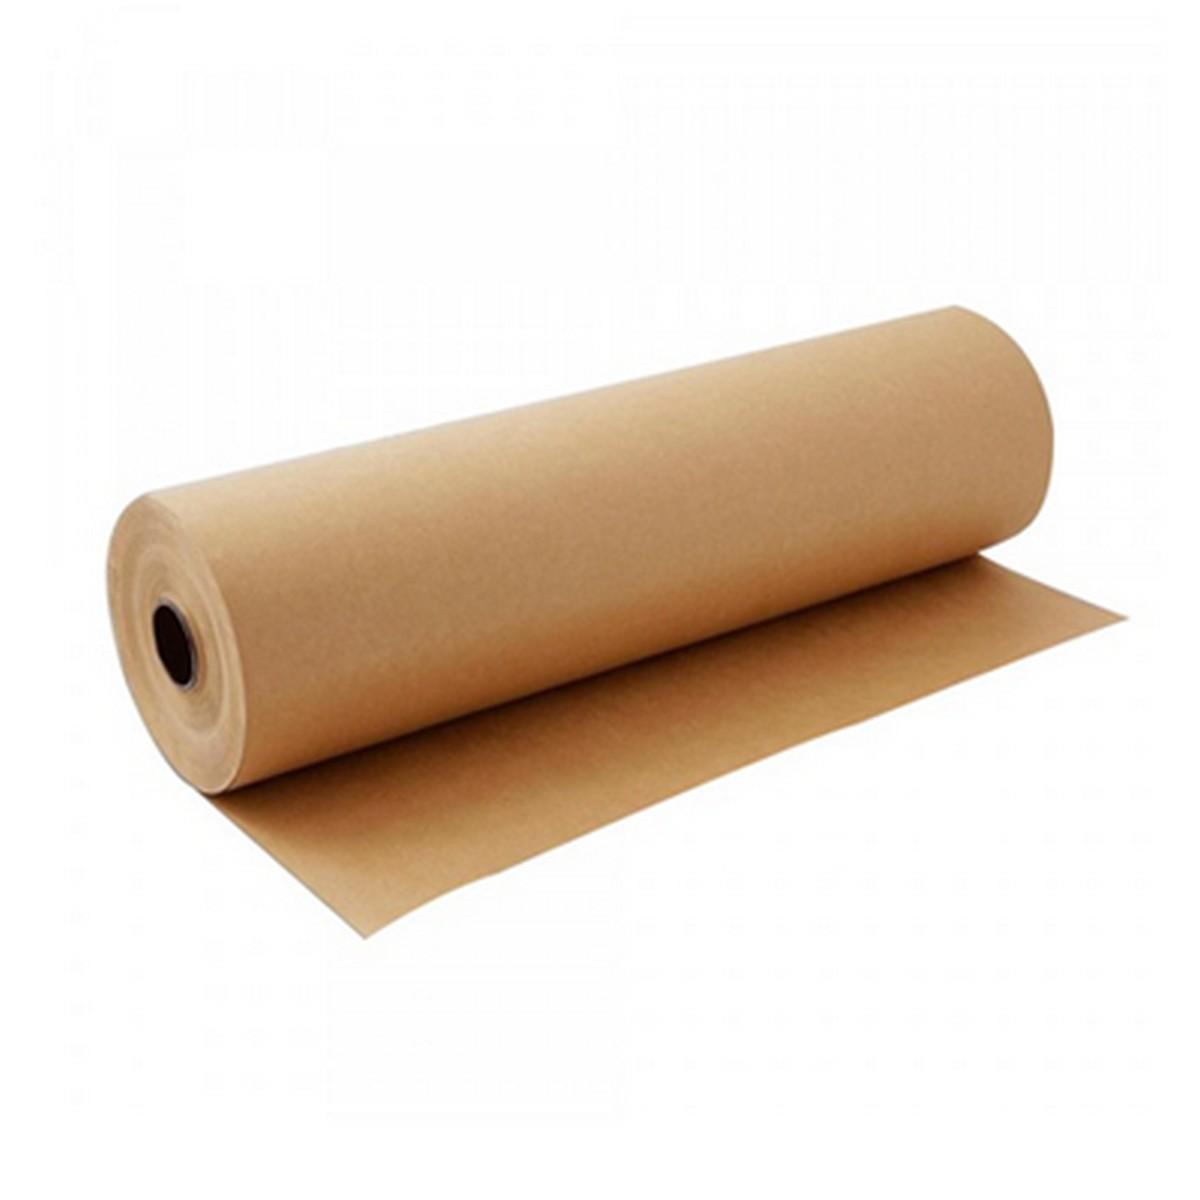 Distribuidor de papelao ondulado